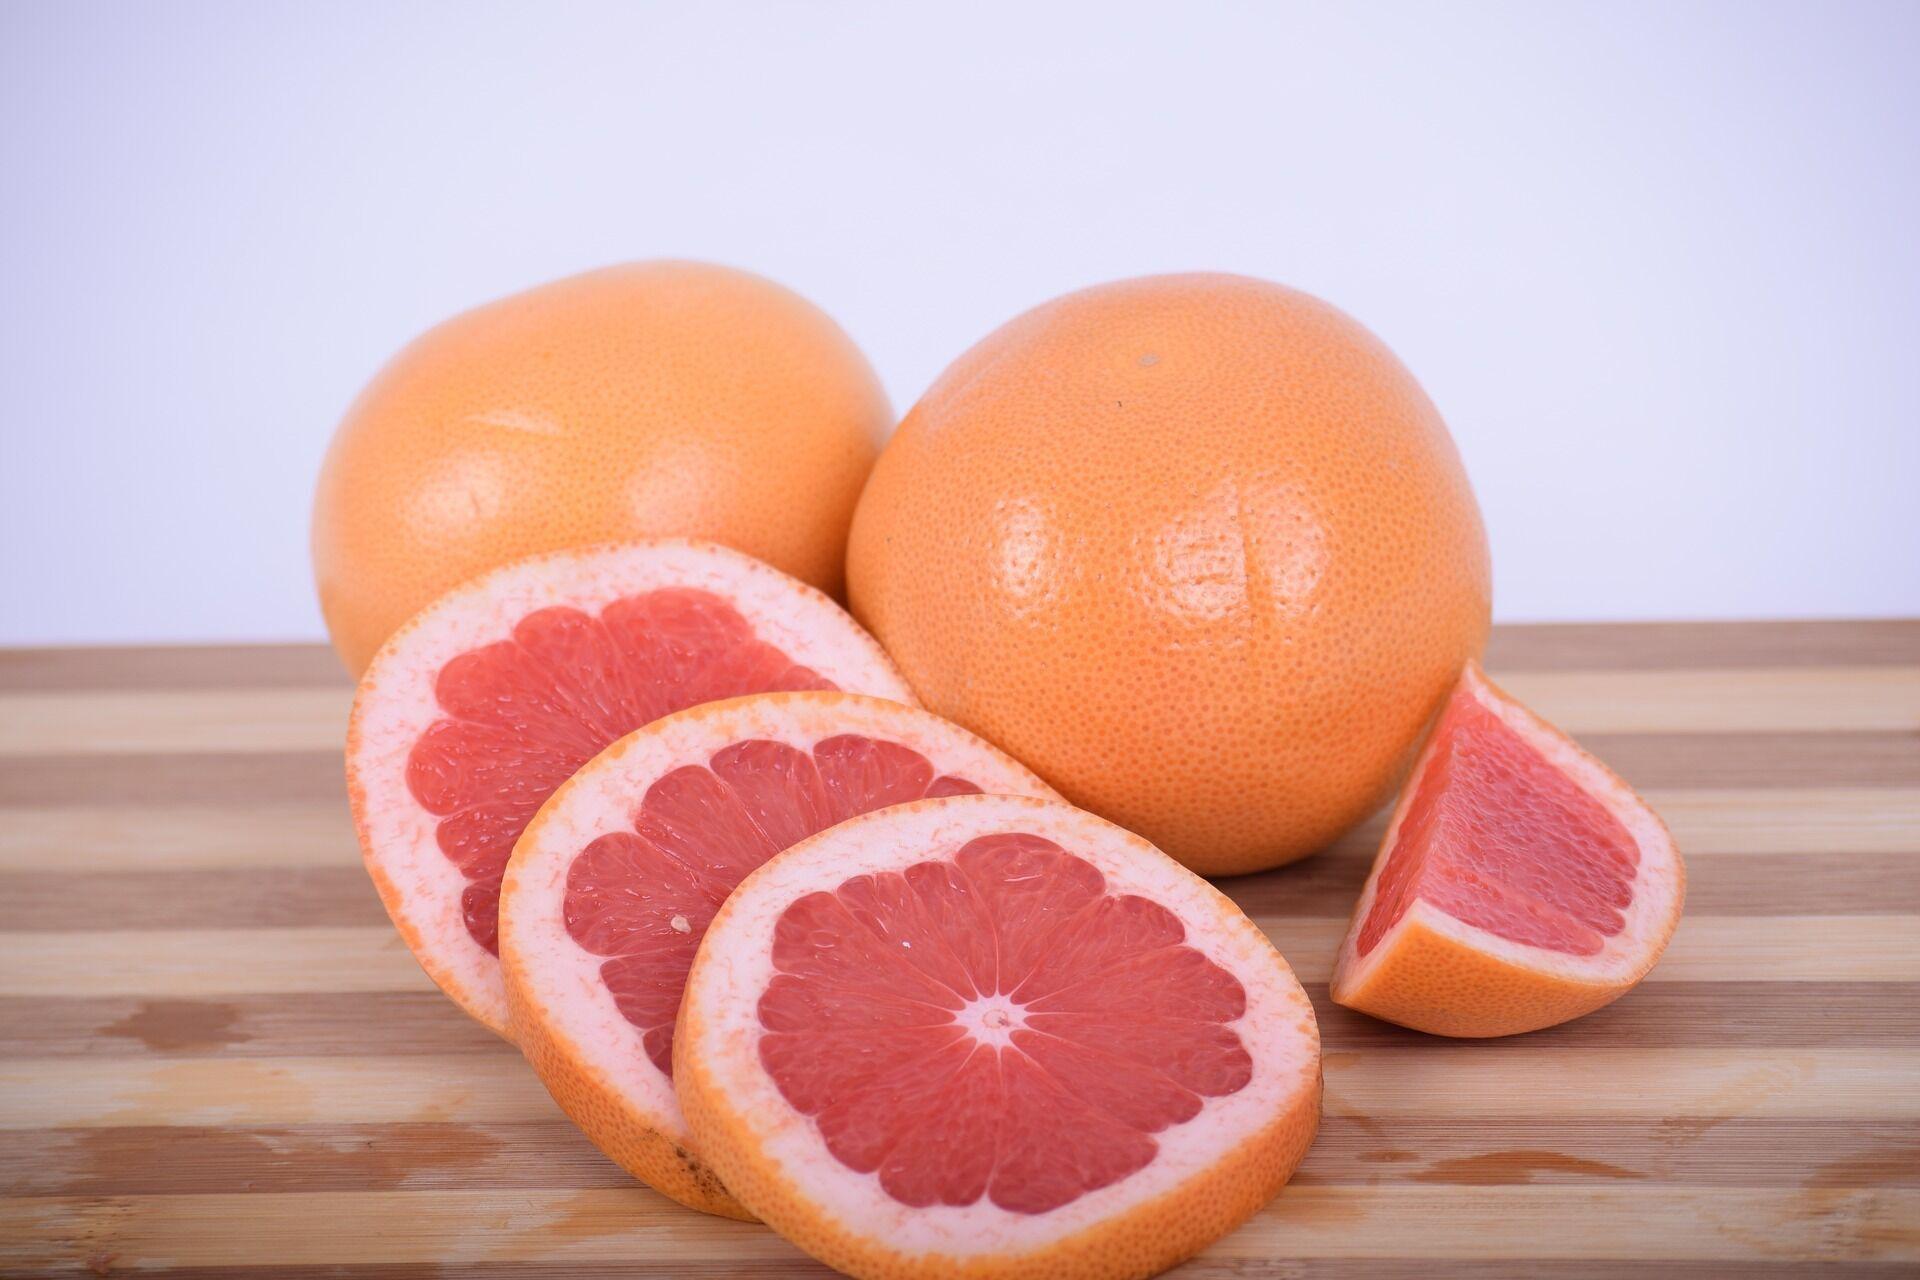 Грейпфрут знижує апетит